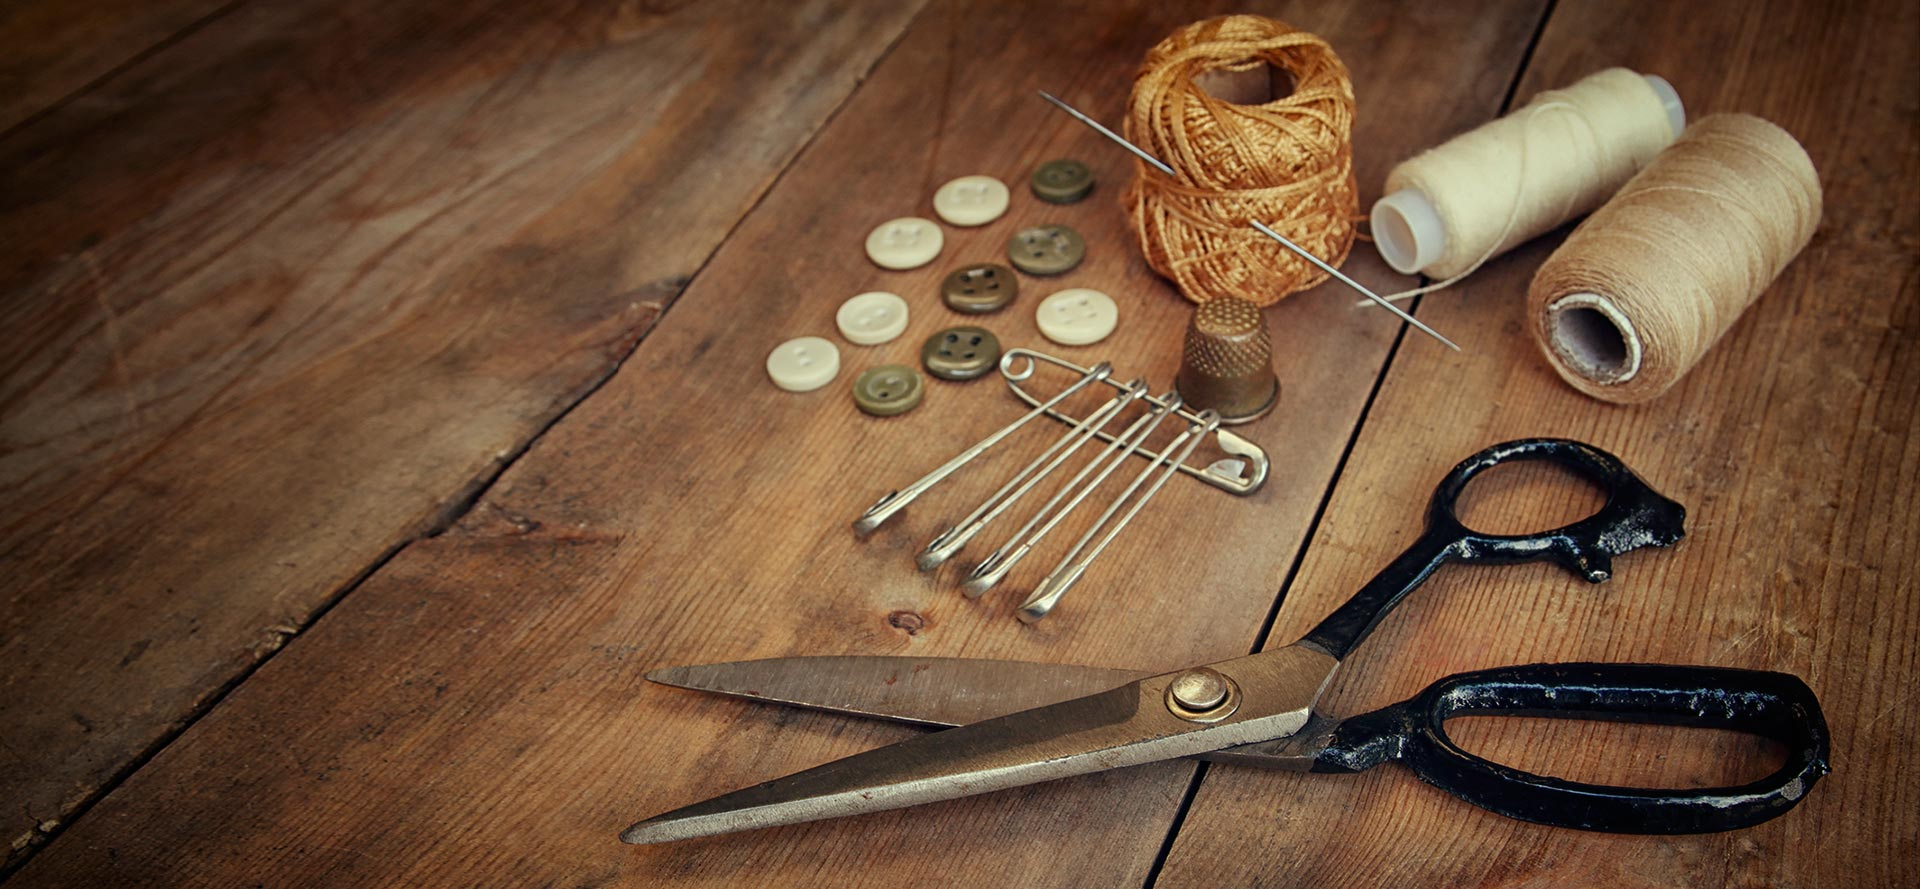 vintage-tailor-scissors.jpg